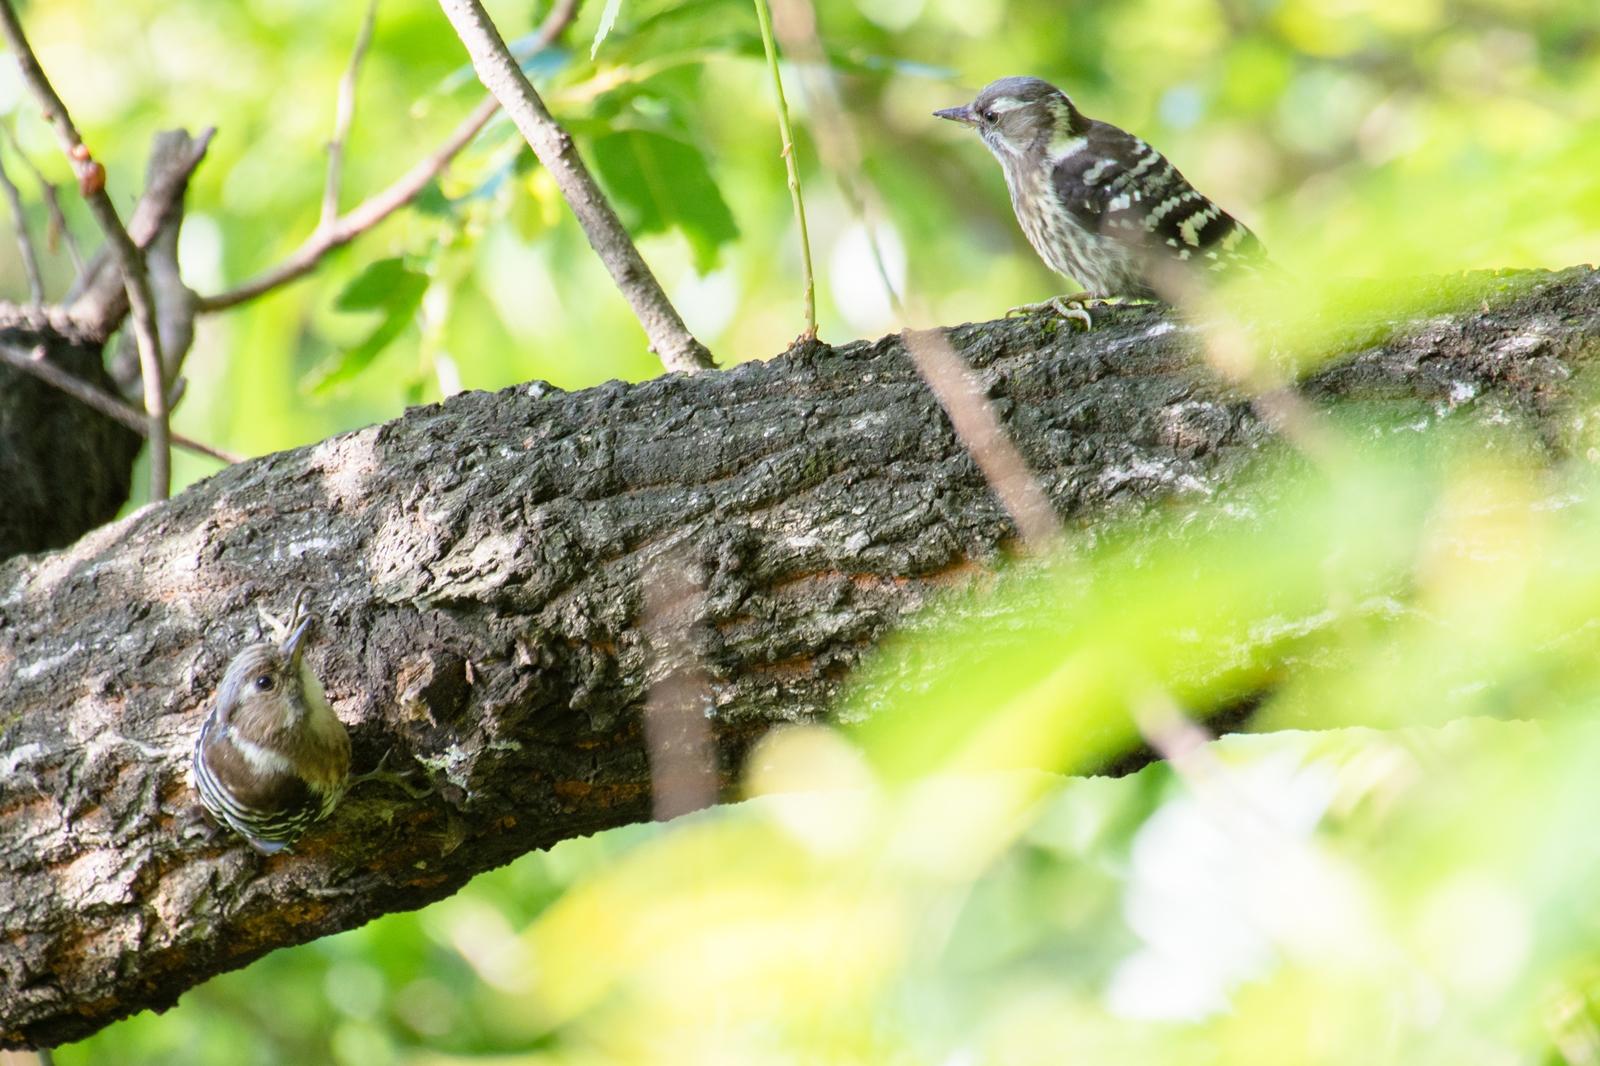 Photo: かくれんぼ Hide-and-seek.  森は大きな大きな遊び場所 追いかけっこをしてみたり かくれんぼをしてみたり 僕を見つけられるかな  Japanese Pygmy Woodpecker. (コゲラ)  #birdphotography #birds  #cooljapan #kawaii  #nikon #sigma   Nikon D7200 SIGMA APO 50-500mm F5-6.3 DG OS HSM  ・小鳥の詩朗読 /poetry reading https://youtu.be/J3s4ioqtFyM?list=PL2YtHGm0-R3qVsaqvQe9OYdJFCkI98wzF